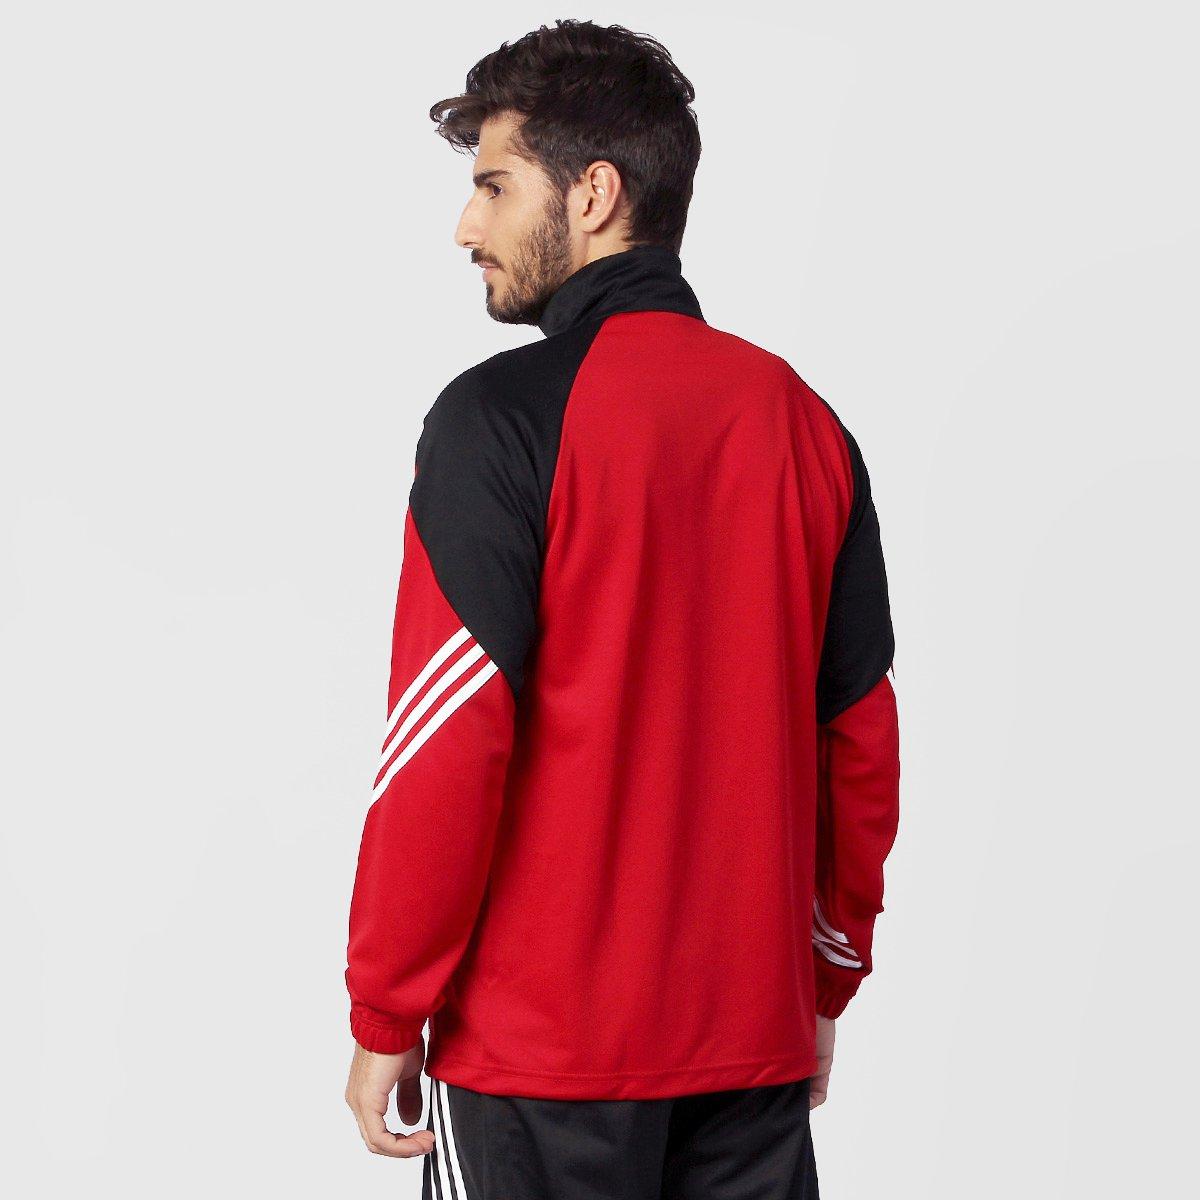 Moletom Adidas Sere 14 Masculino - Compre Agora  0605f347da893